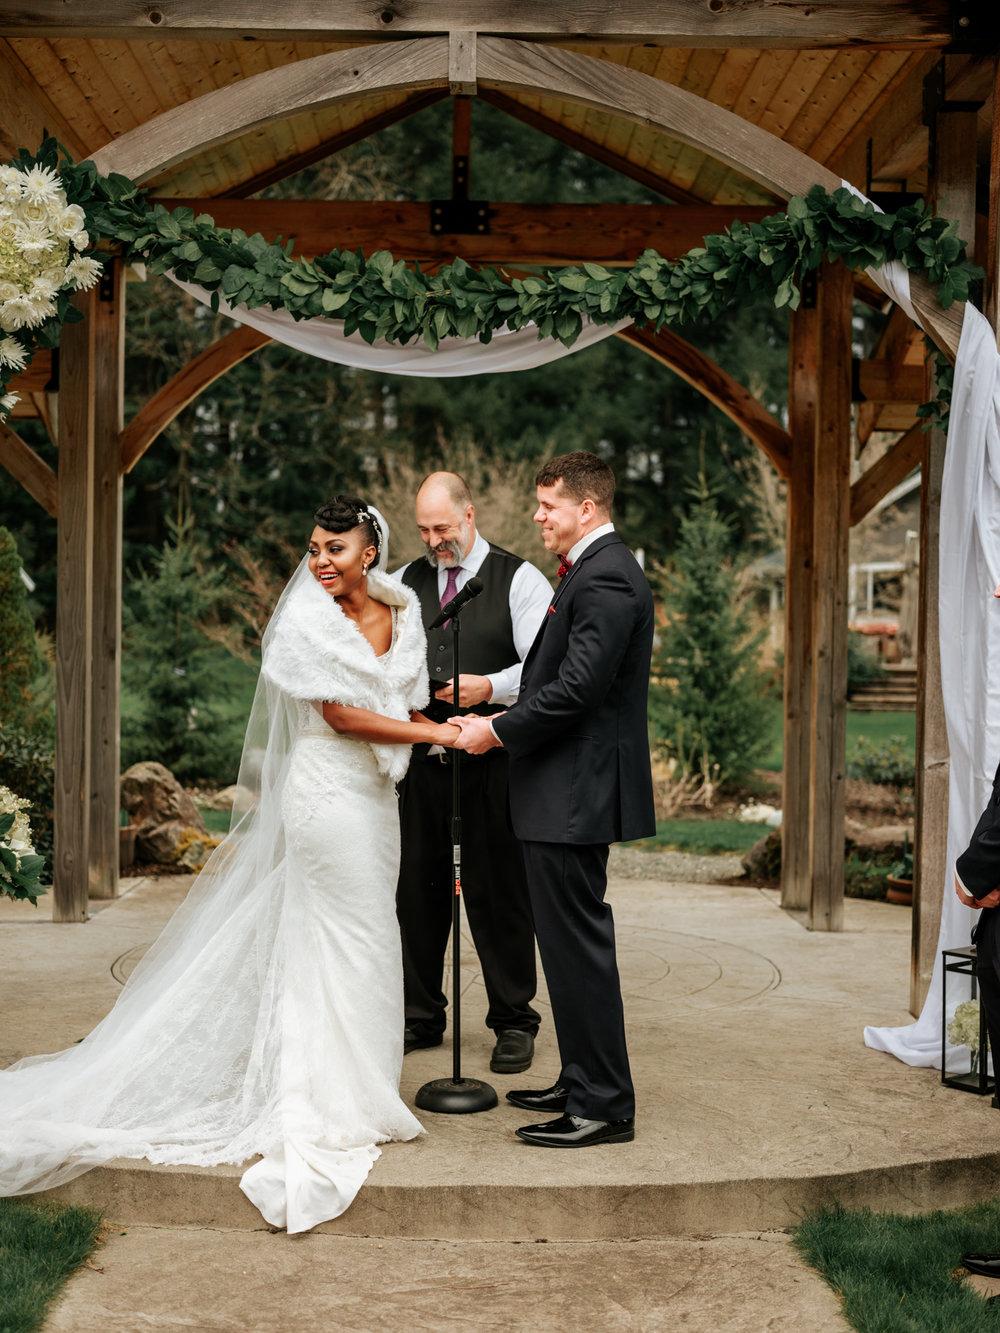 Stolen Glimpses Seattle Wedding Photographer at Rein Fire Ranch 61.jpg